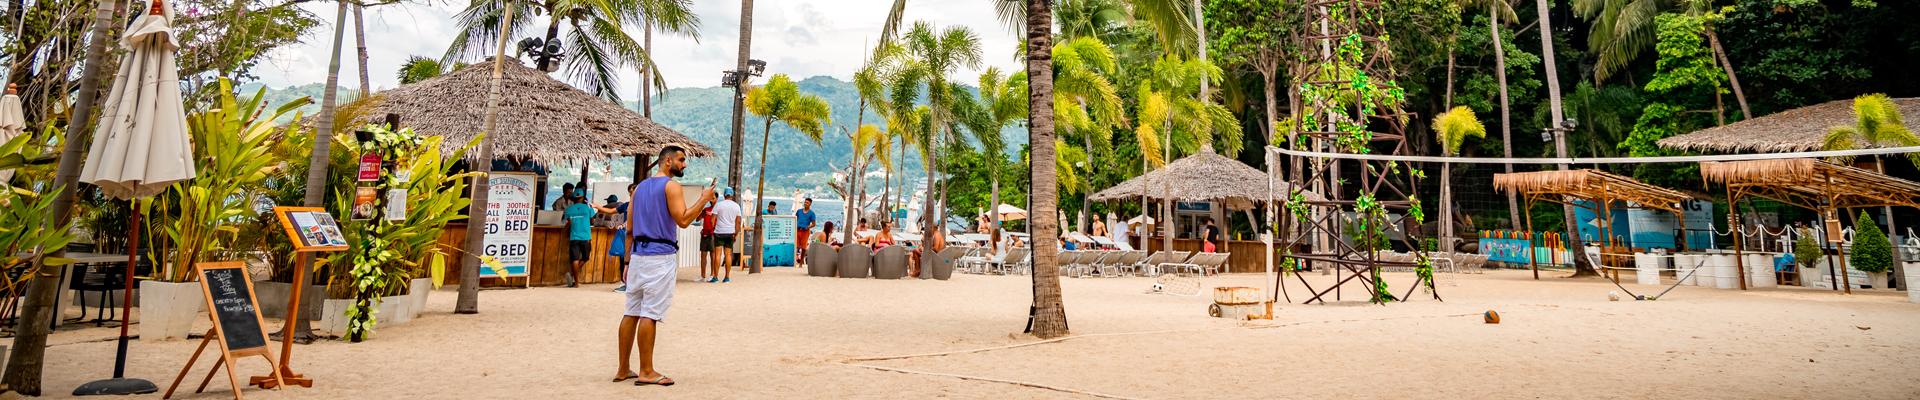 Paradise Beach in Phuket, Thailand